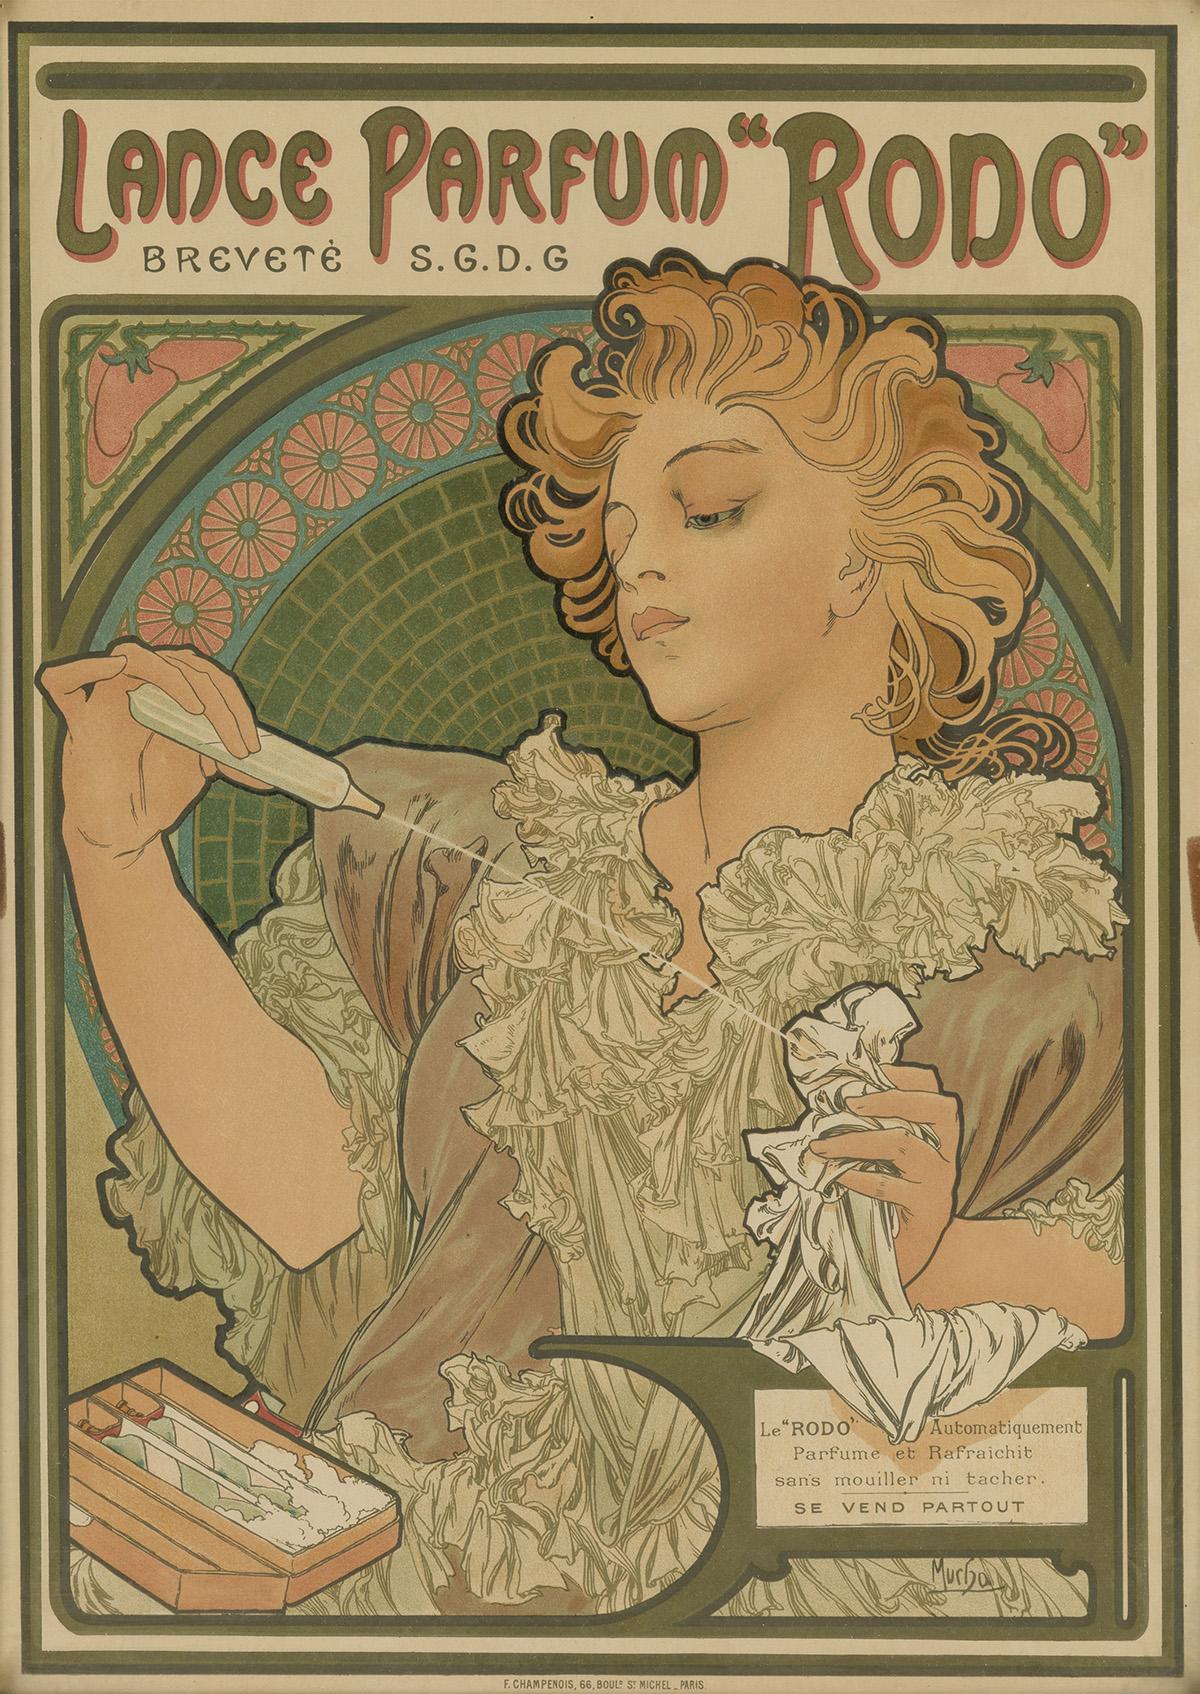 ALPHONSE-MUCHA-(1860-1939)-LANCE-PARFUM-RODO-1896-17x12-inch